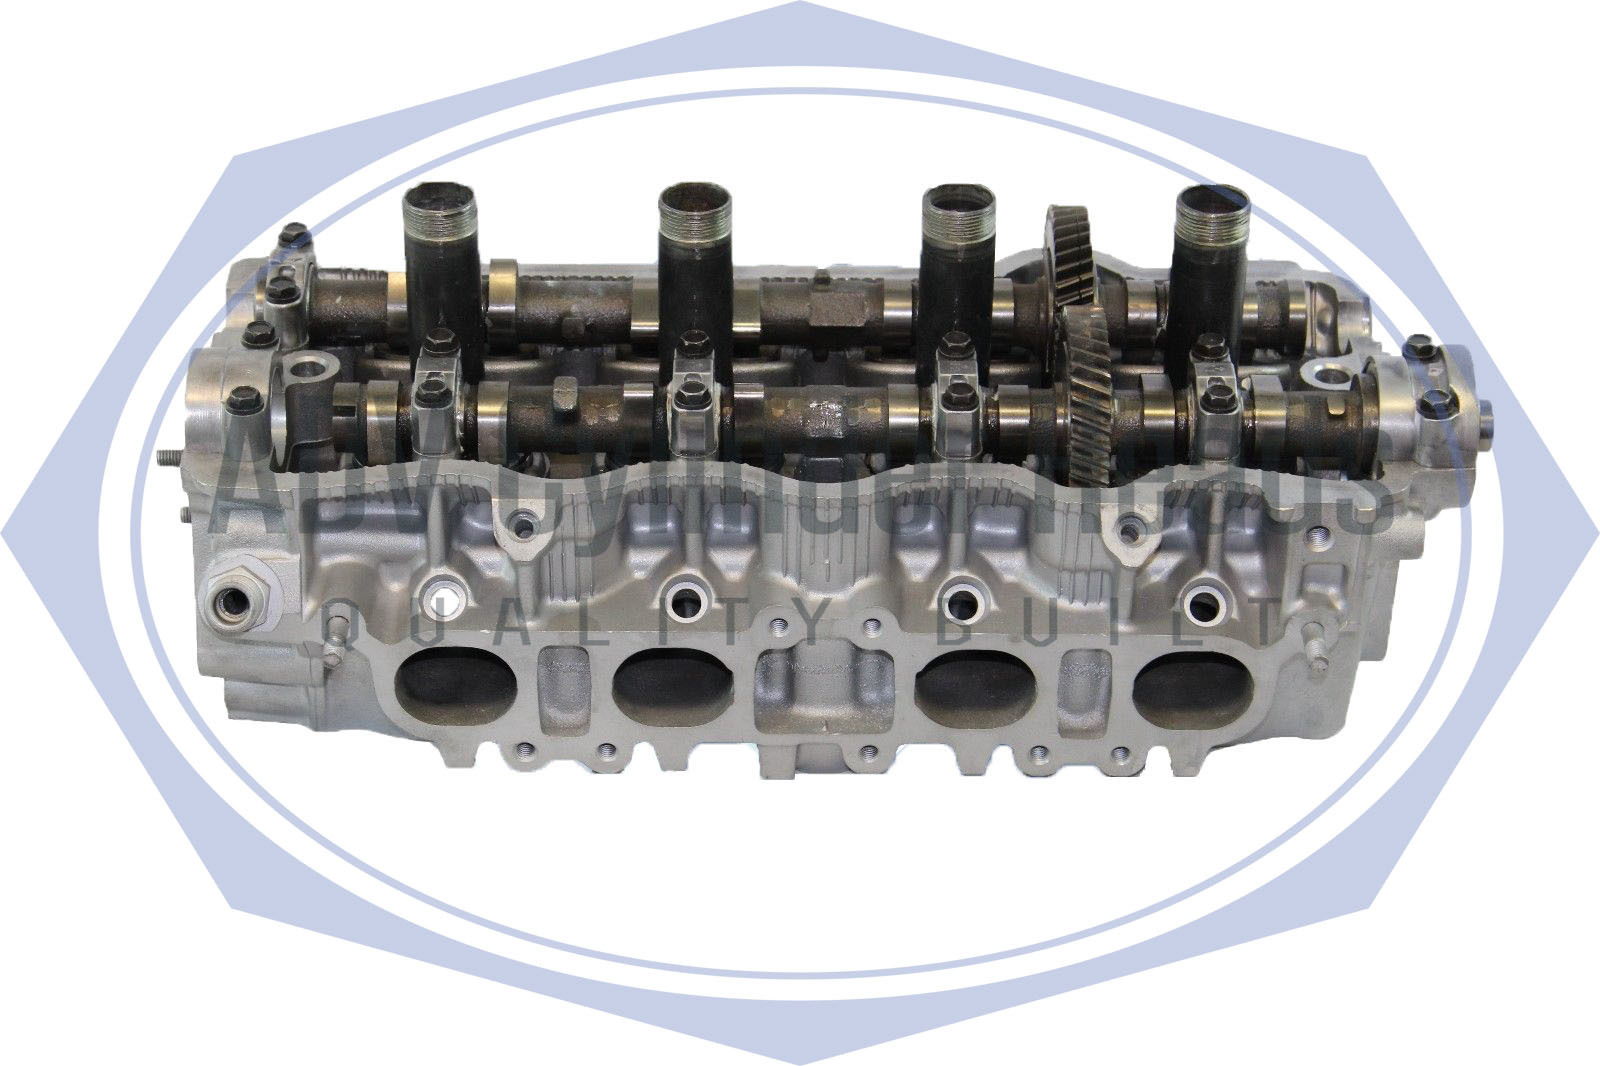 Cylinder Head Gasket Honda Civic 2001-2005 12251-Plc-003 Save Money